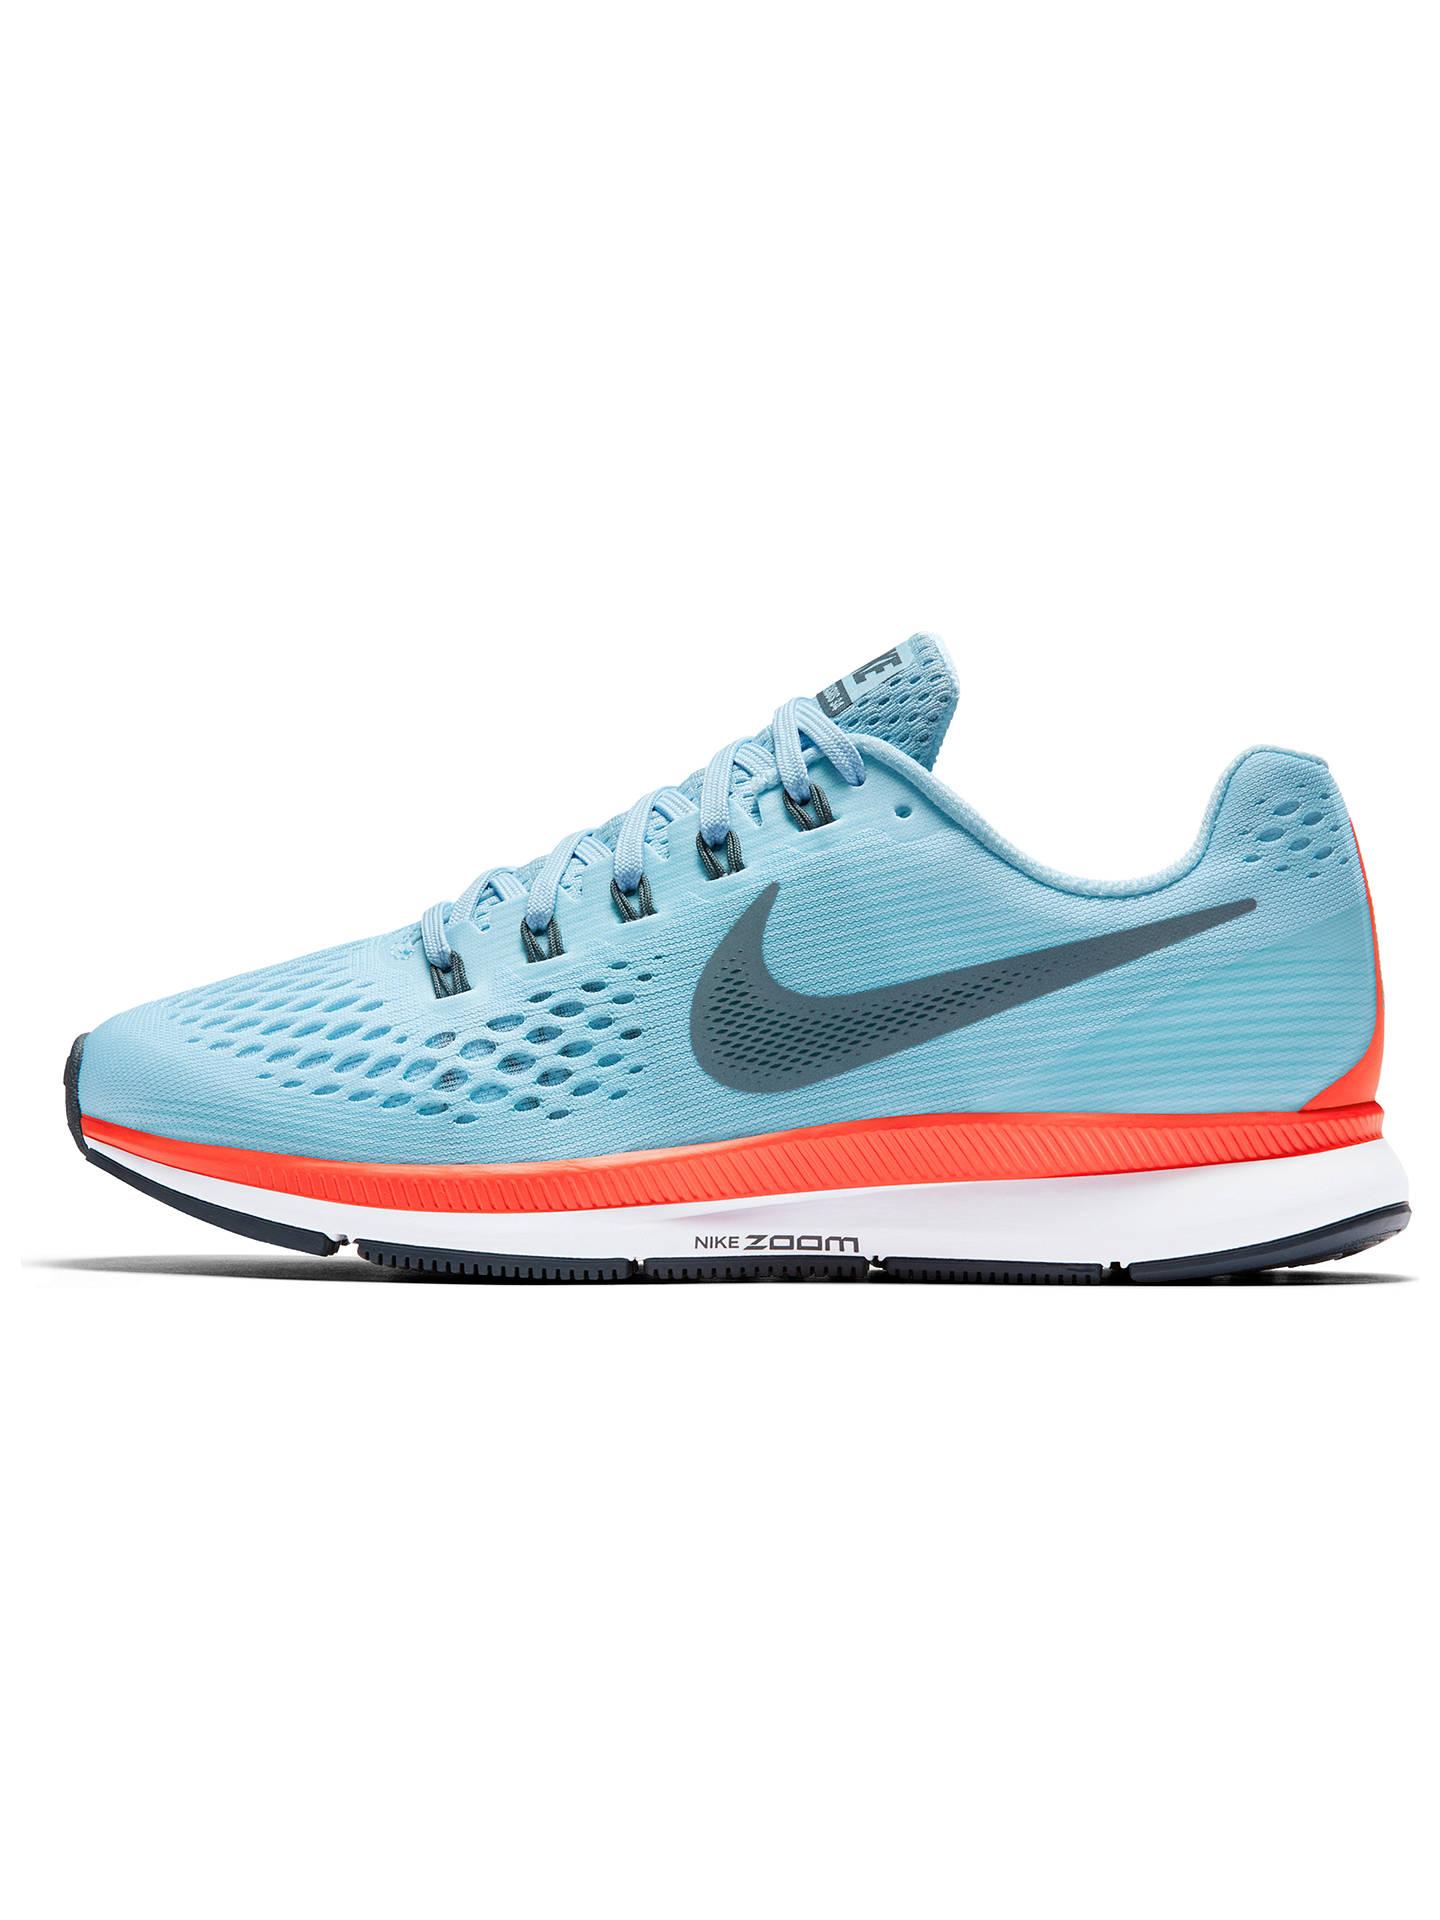 35f31972eb3 ... Buy Nike Air Zoom Pegasus 34 Women s Running Shoes